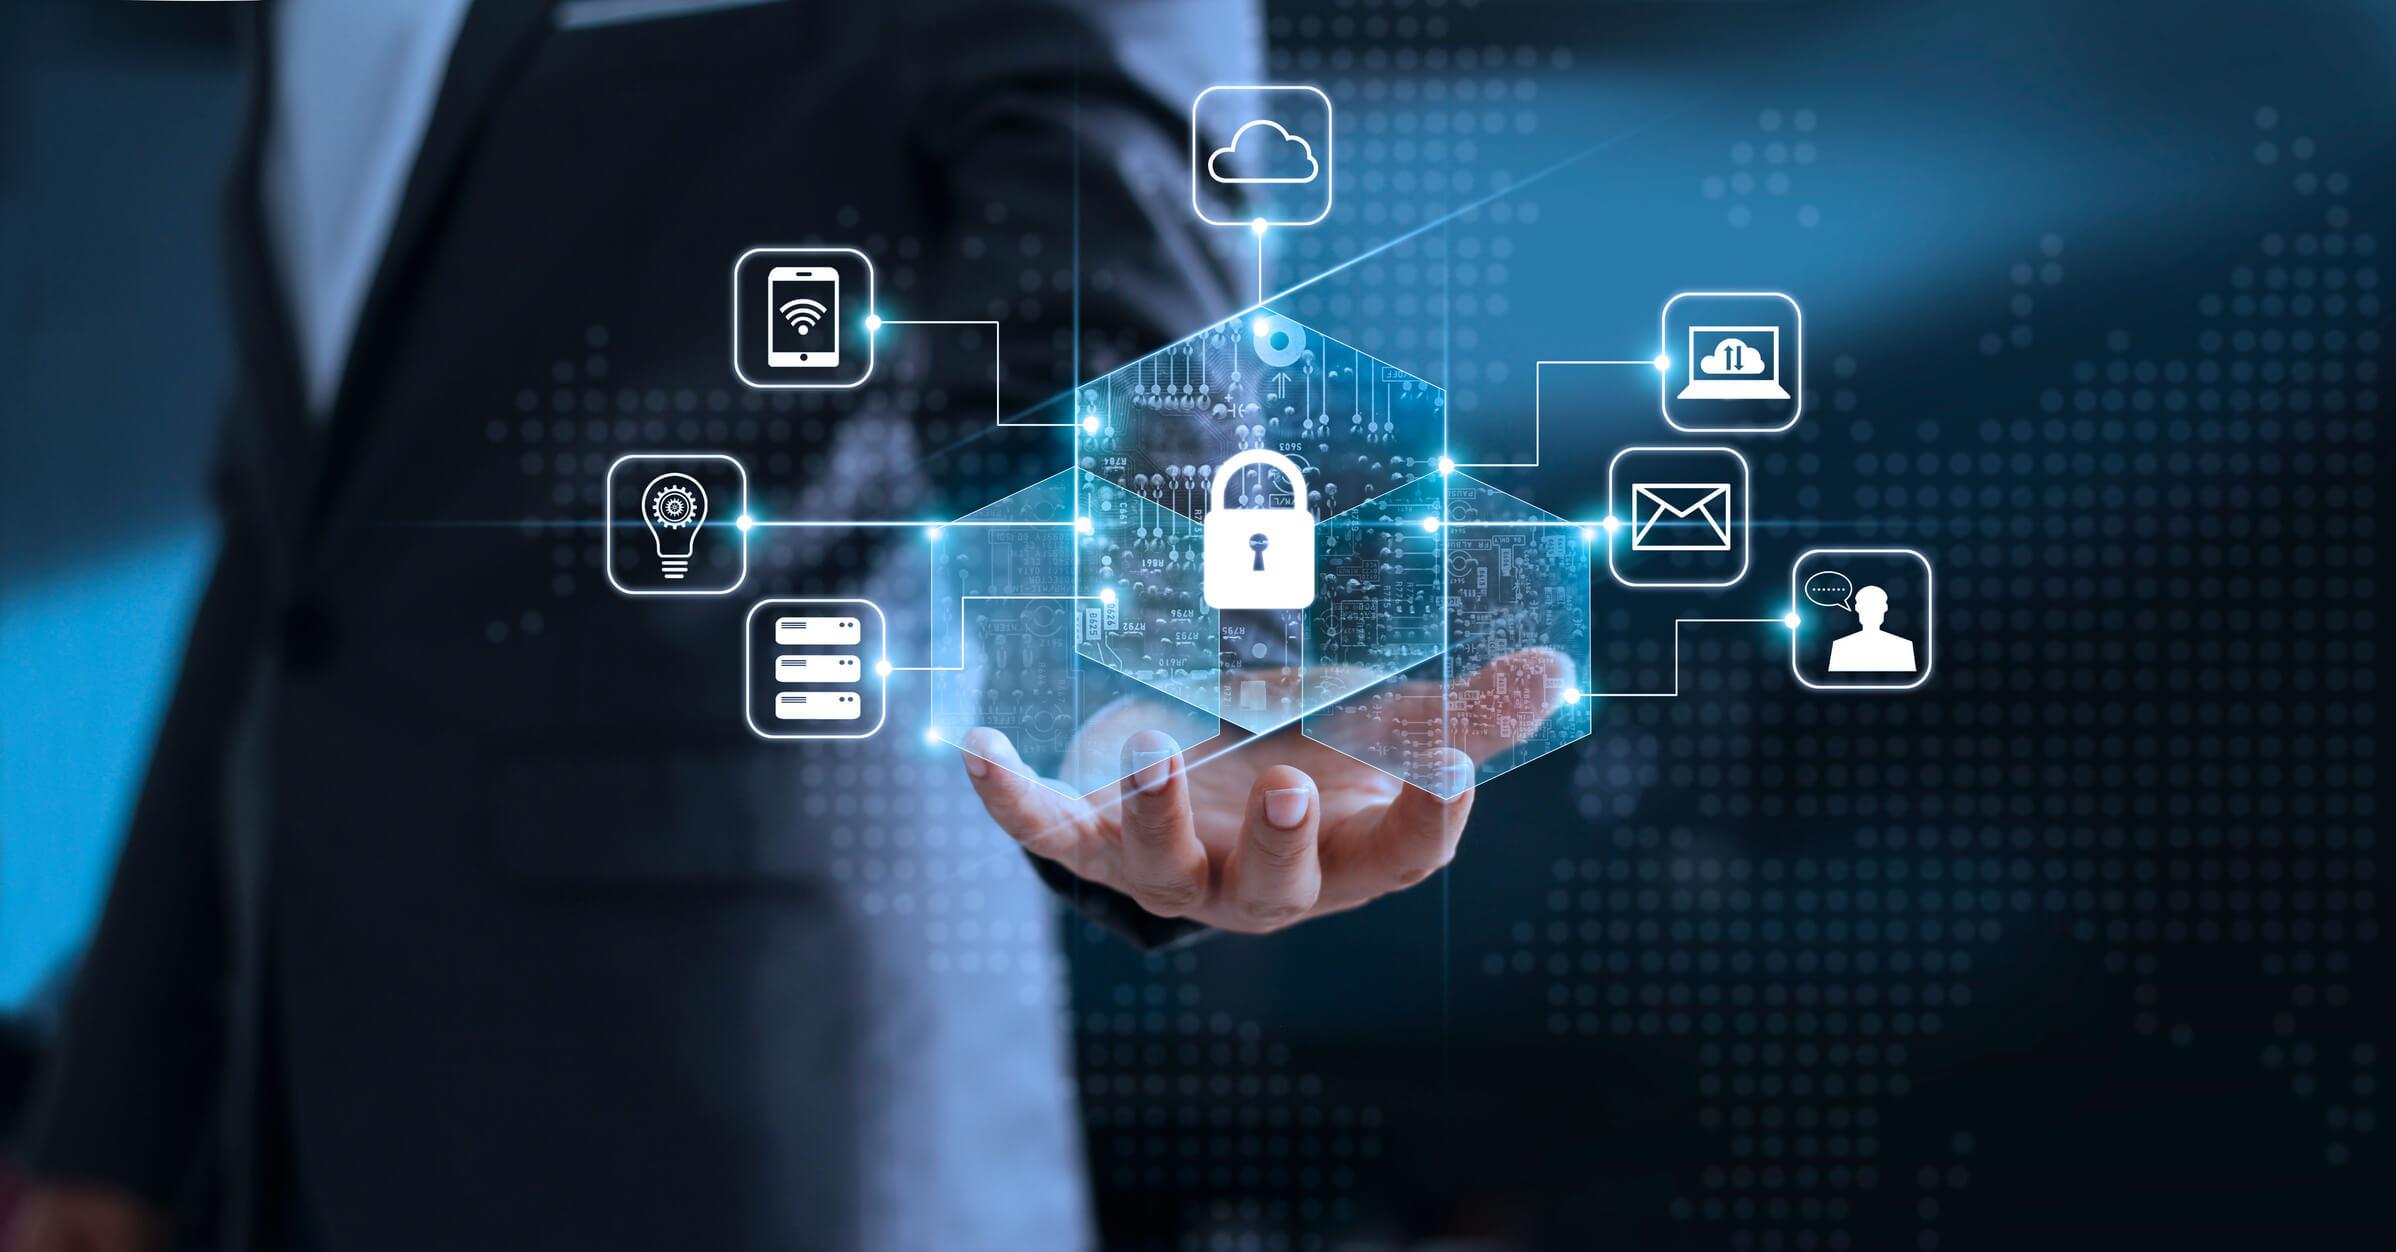 Tecnologias Intrusivas: Vale a pena perder a privacidade?